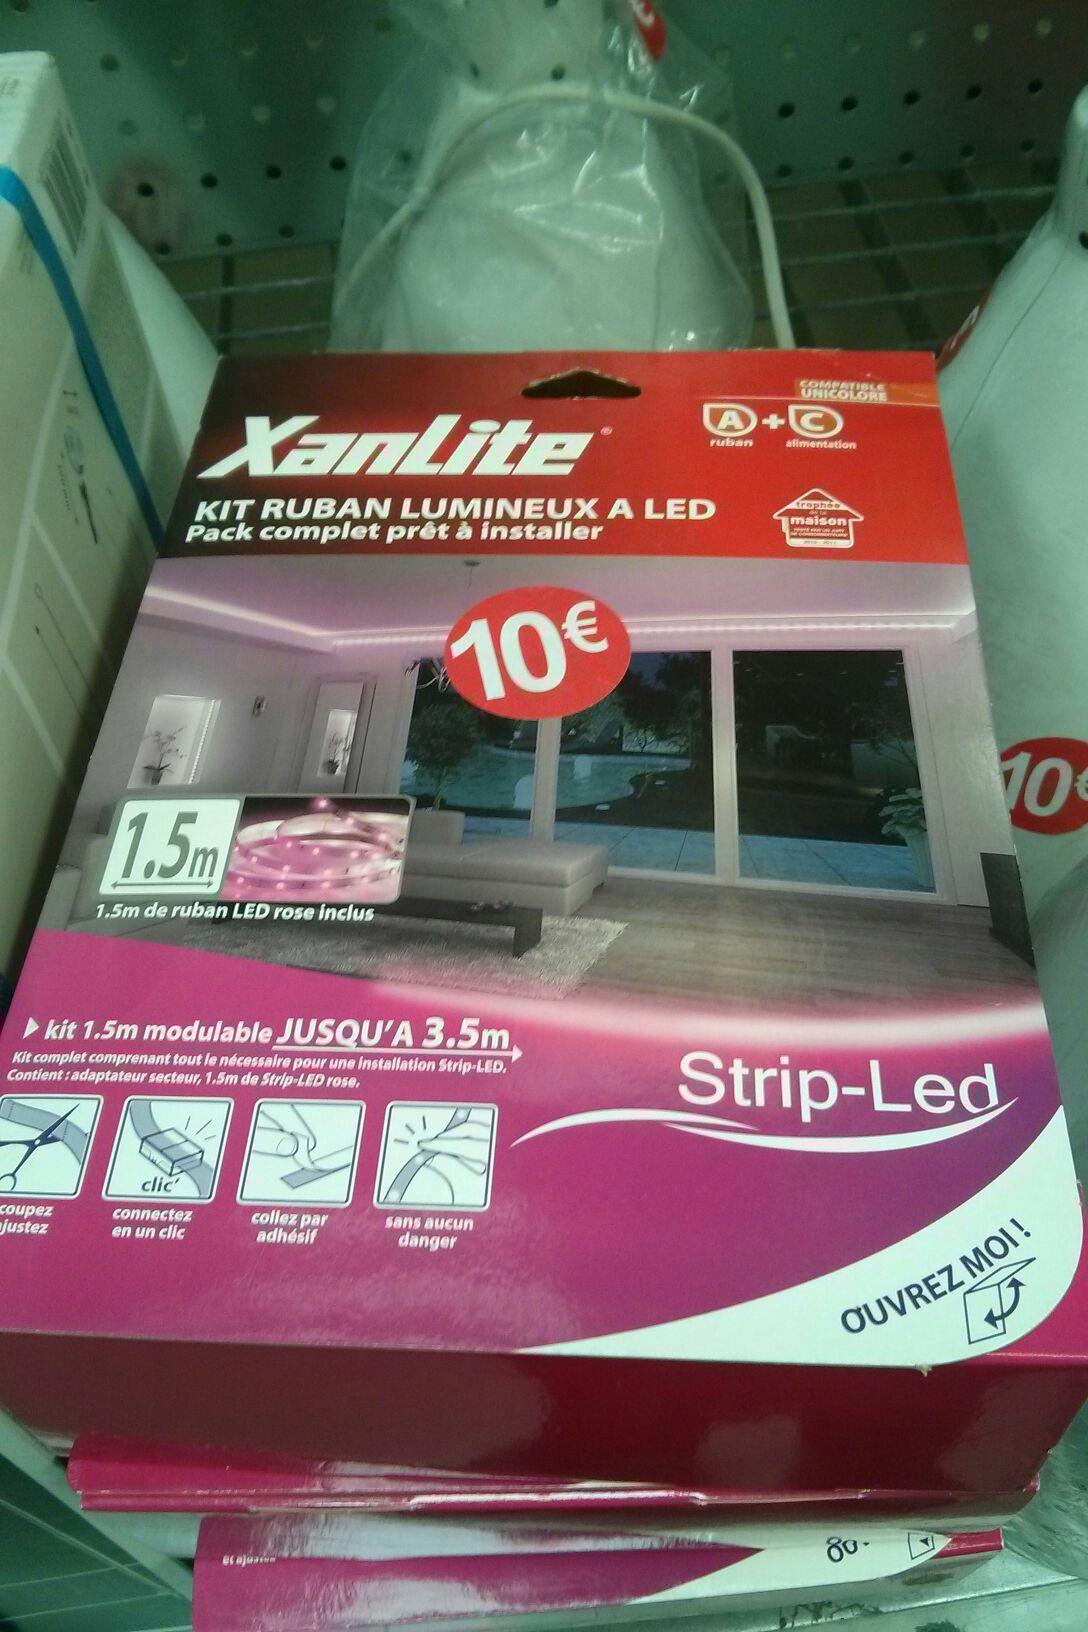 kit ruban lumineux rose à led 1m50 Xanlite pack complet